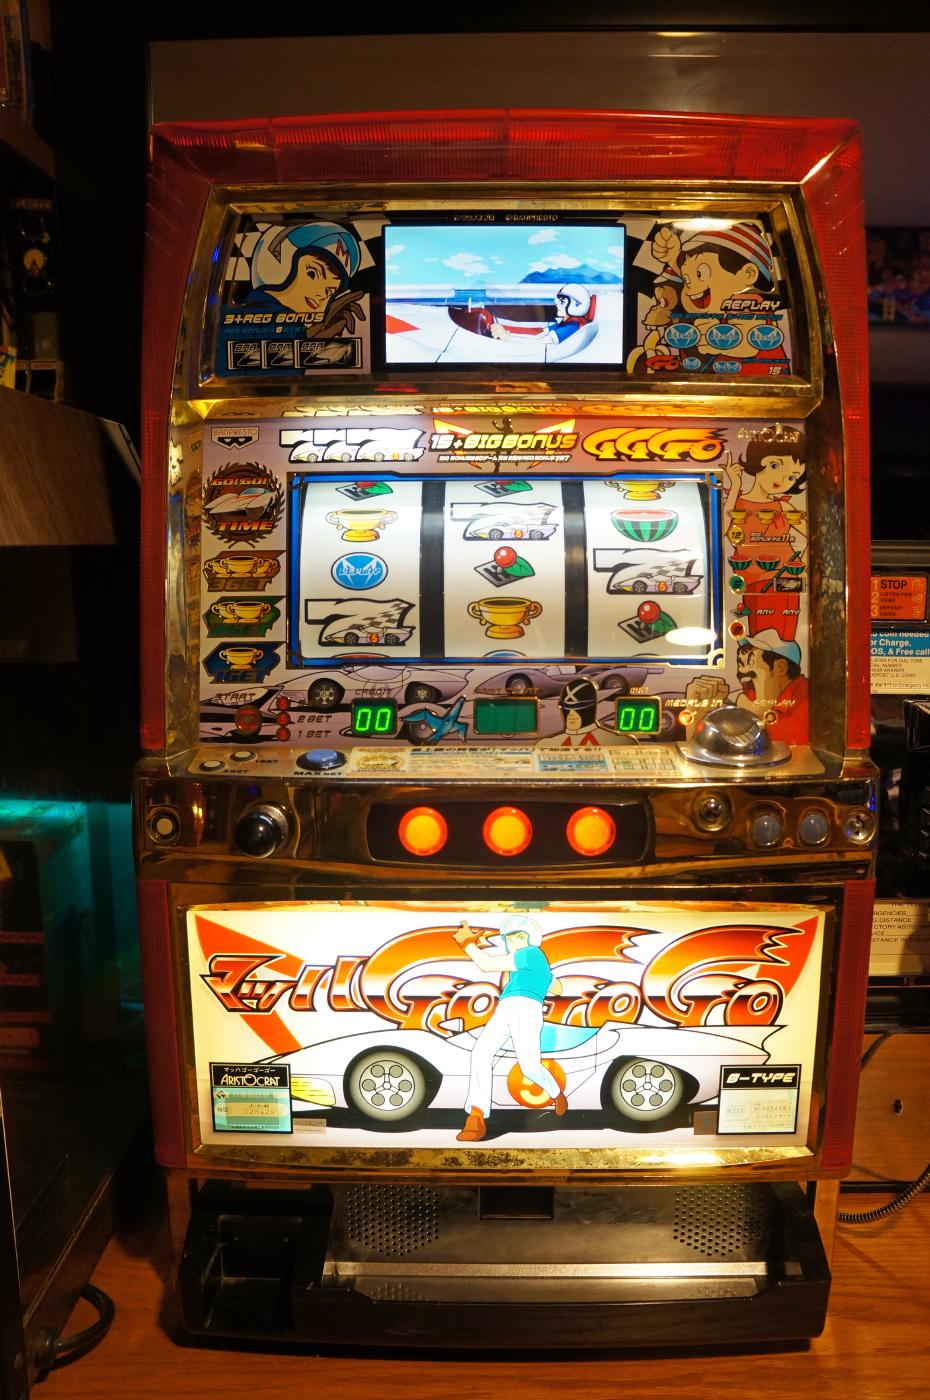 The Basement Arcade